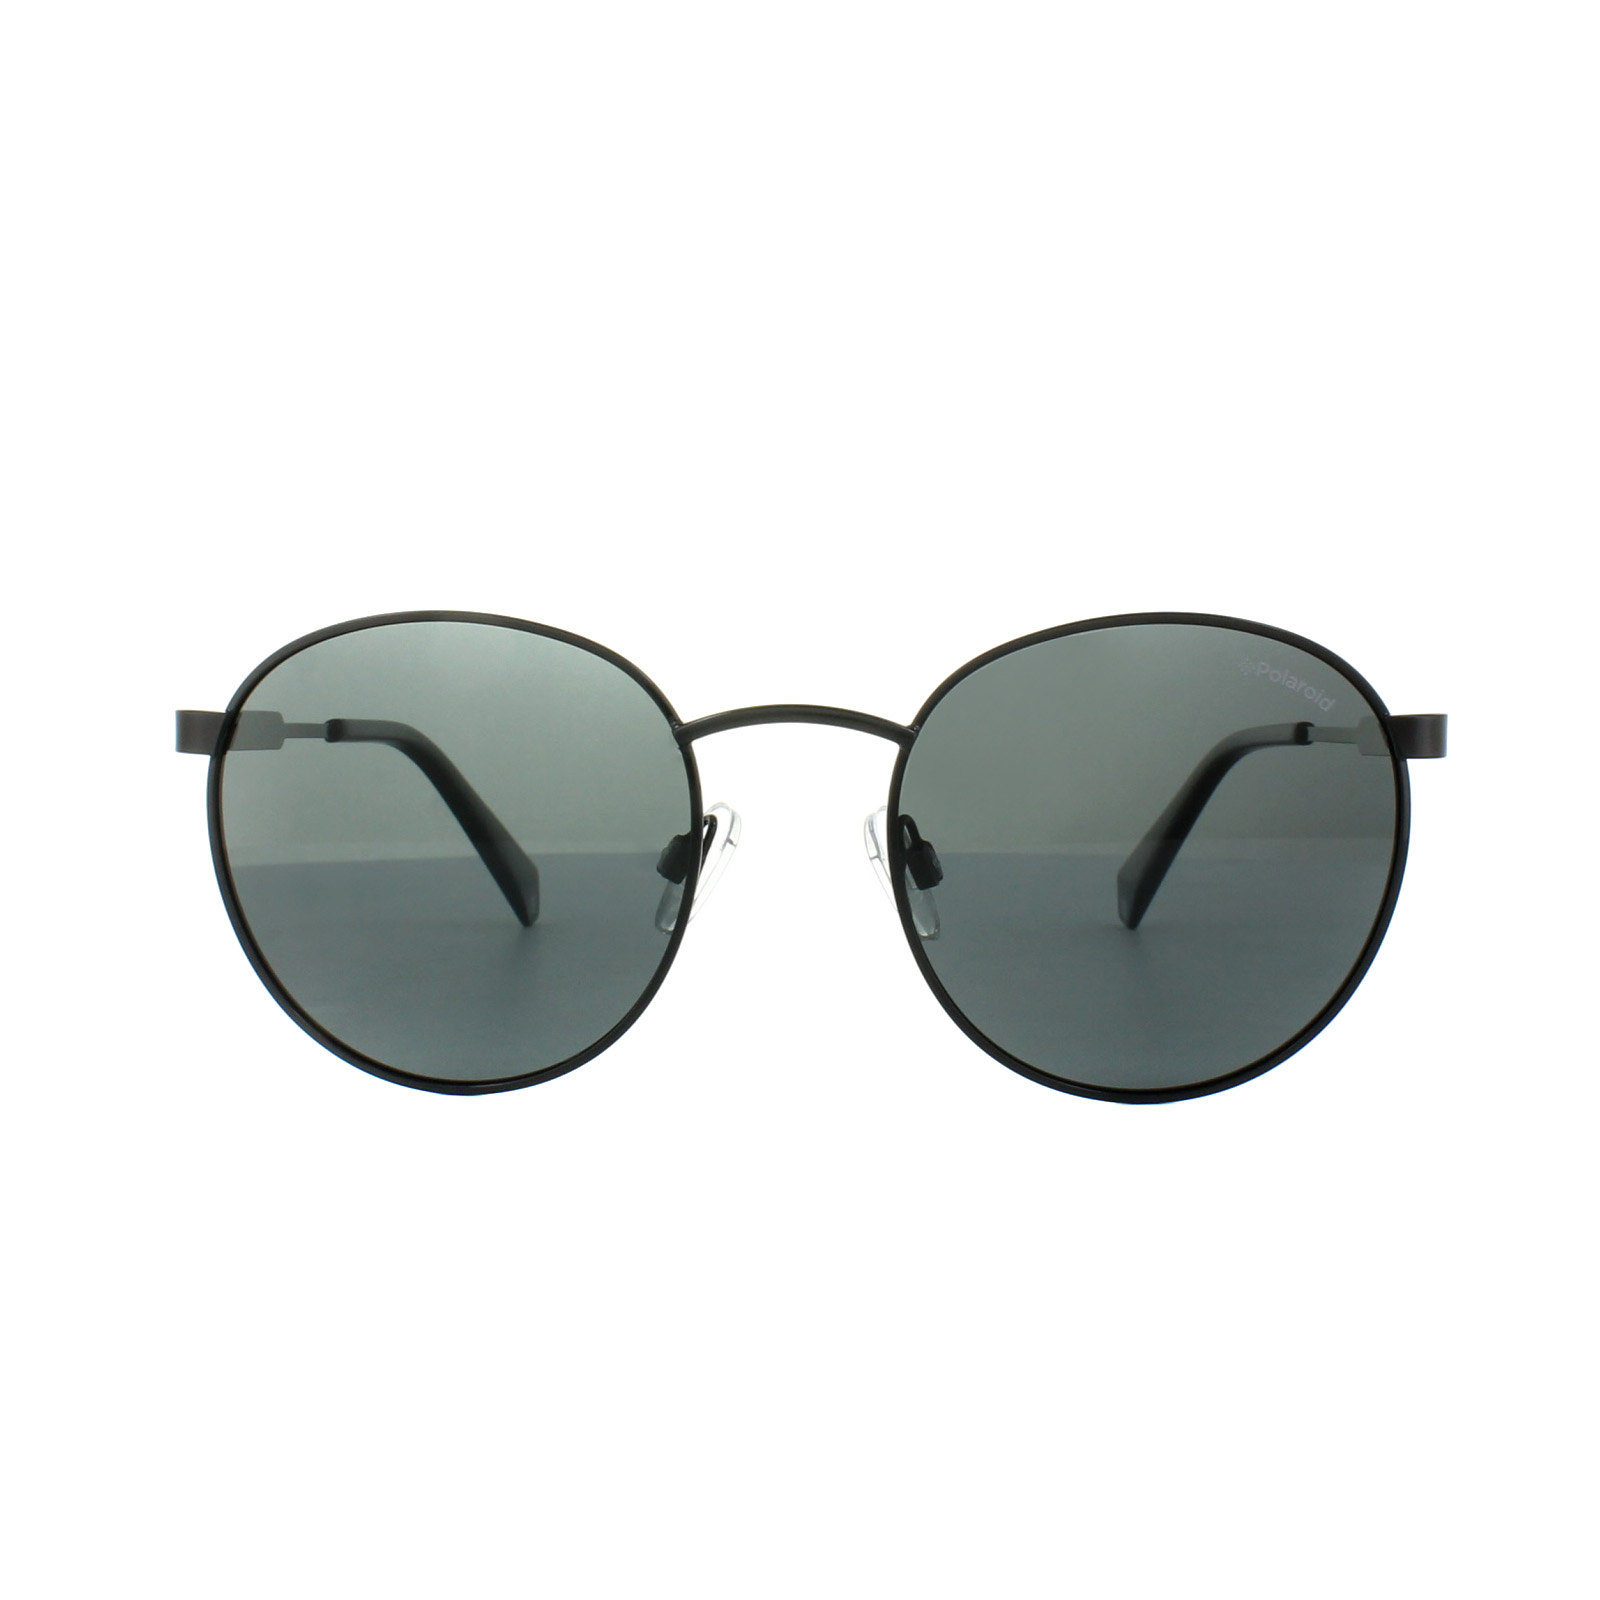 9360b5966a6 Sentinel Polaroid Sunglasses PLD 2053 S 807 M9 Black Dark Grey Polarized